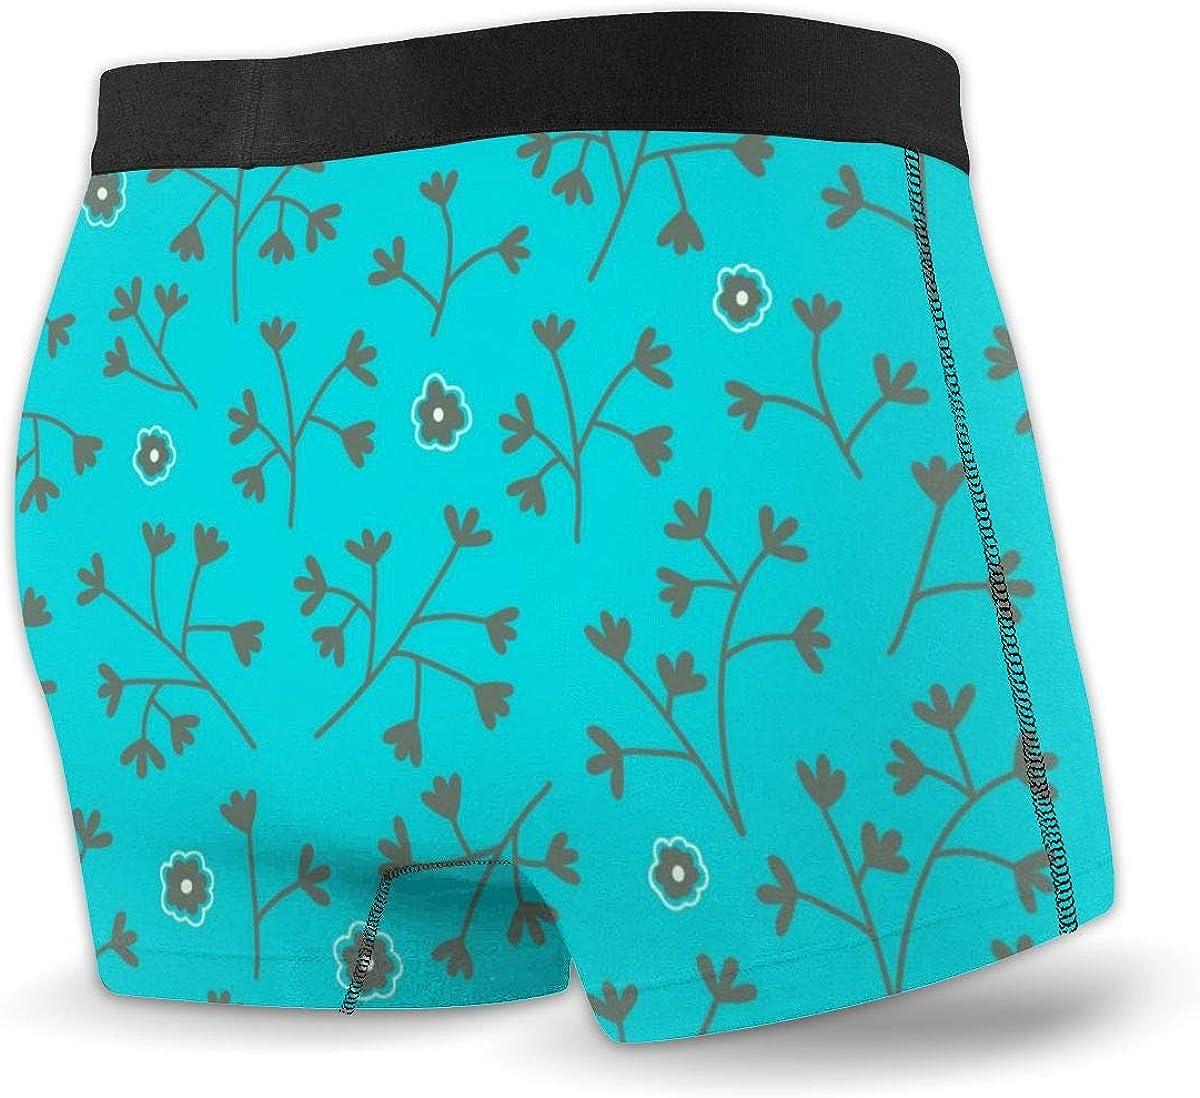 Randolph Wordsworth Mens Boxer Briefs Turquoise Blue Small Flowers Boys Trunks Underwear Short Leg Breathable Man